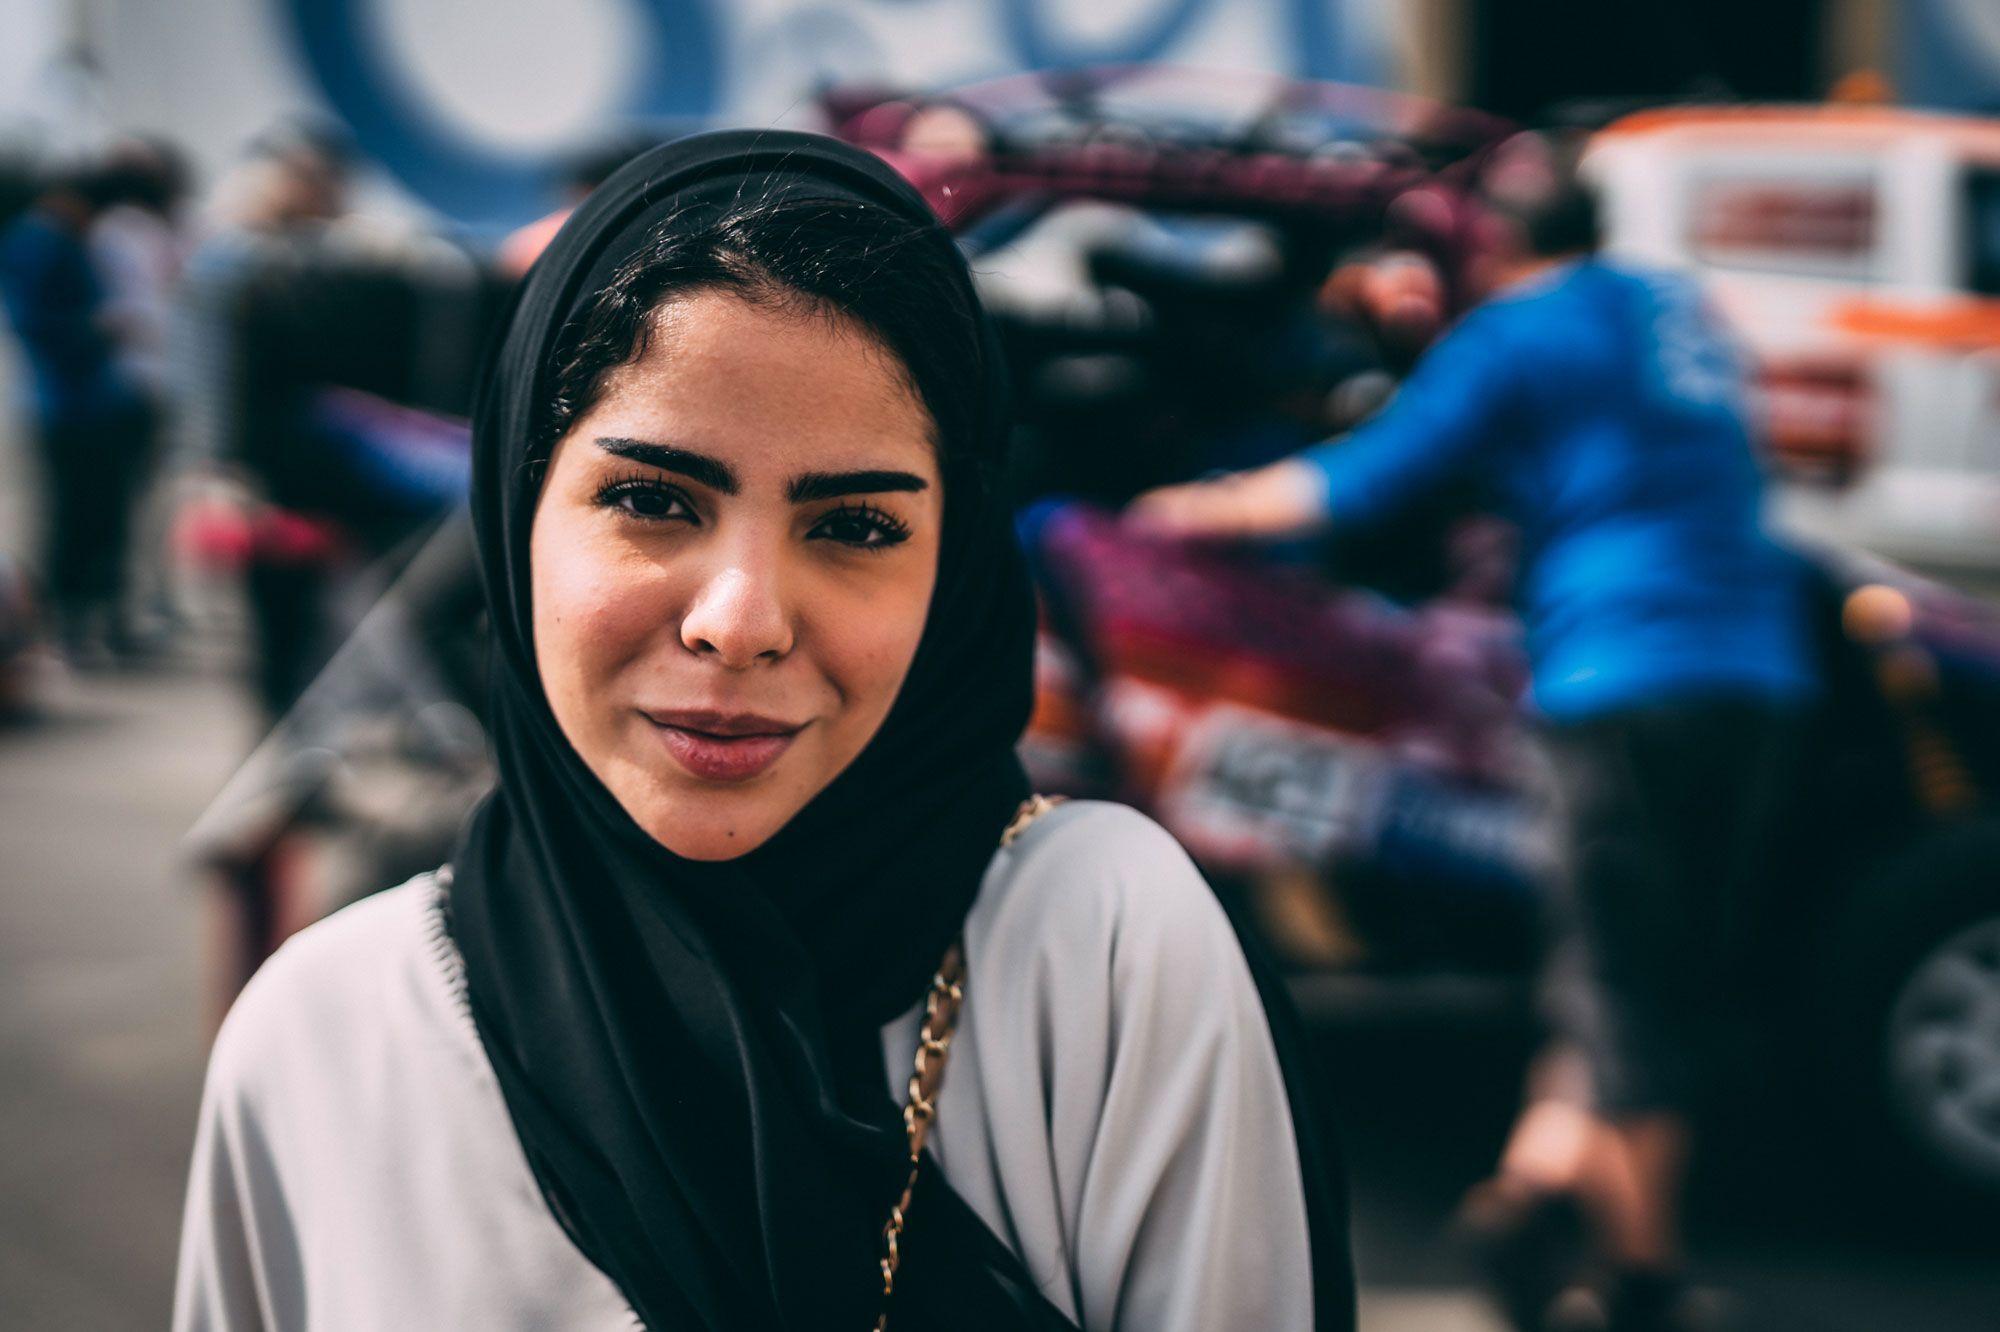 recherche femme arabie saoudite